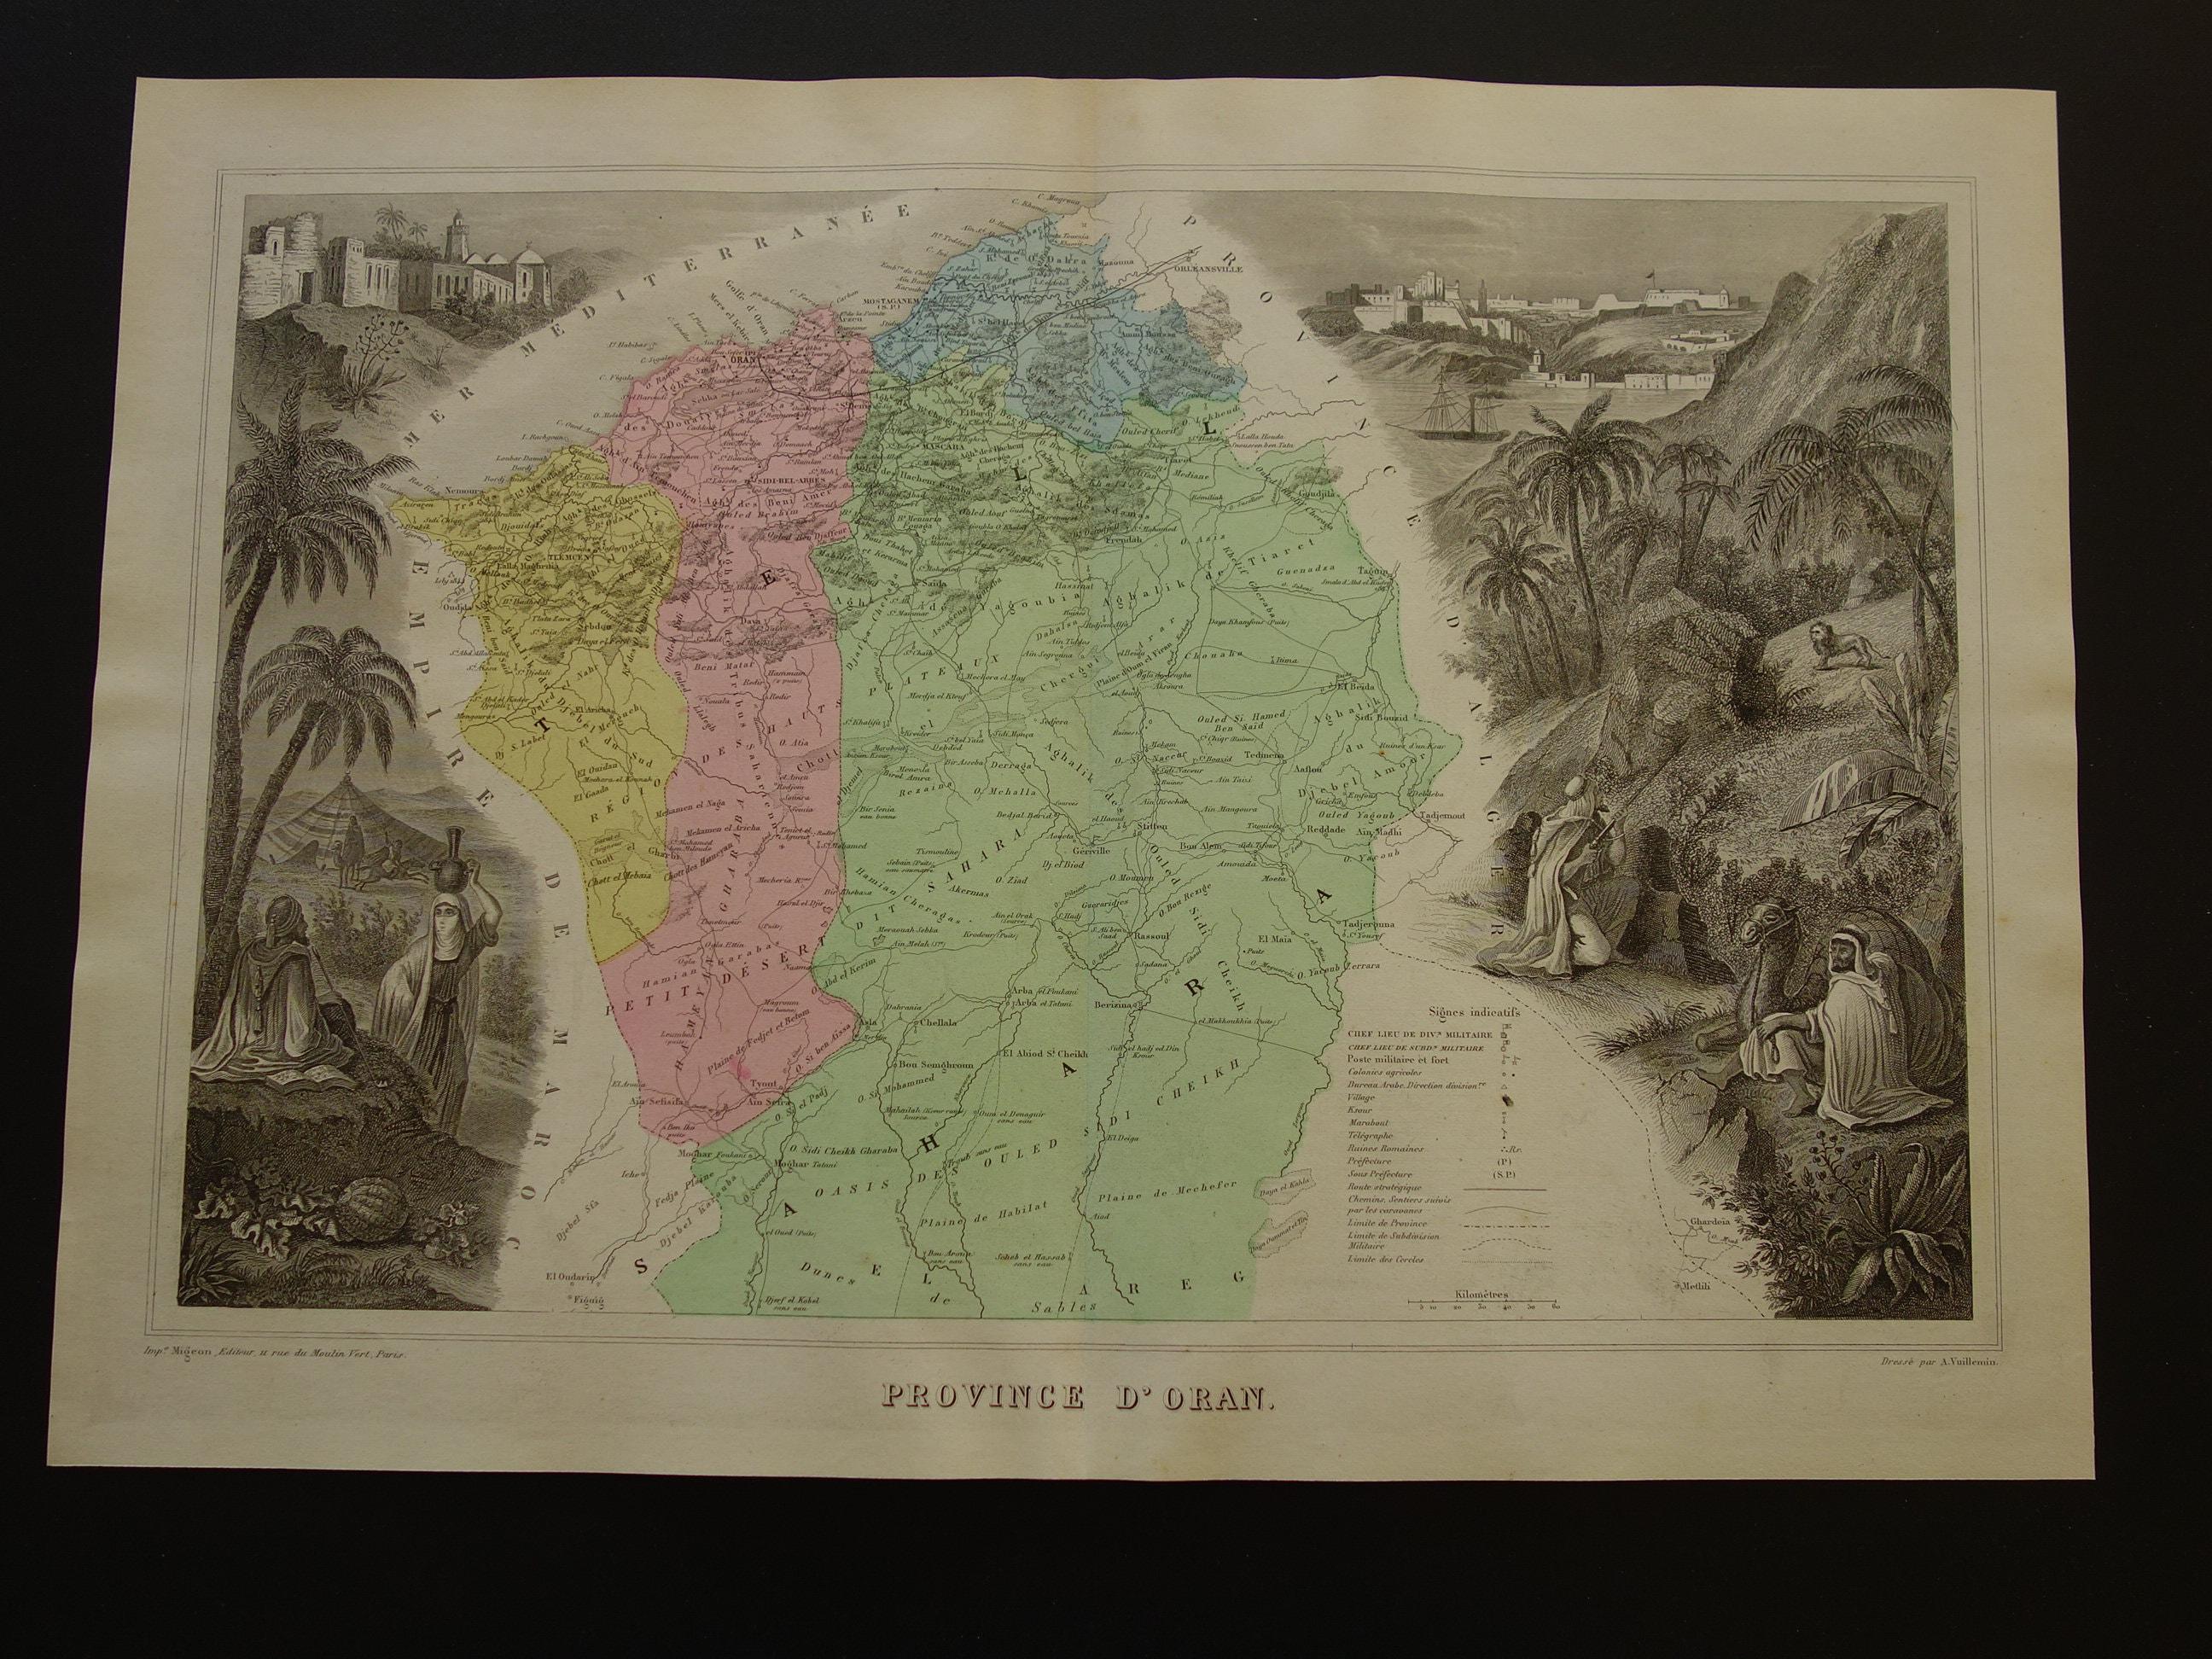 Carte Zero Algerie.1876 Old Map Of Oran Province Algeria Antique Hand Colored Engraving Vieille Carte De L Algerie Mostaganem Sig Saida 34x47c 13x19